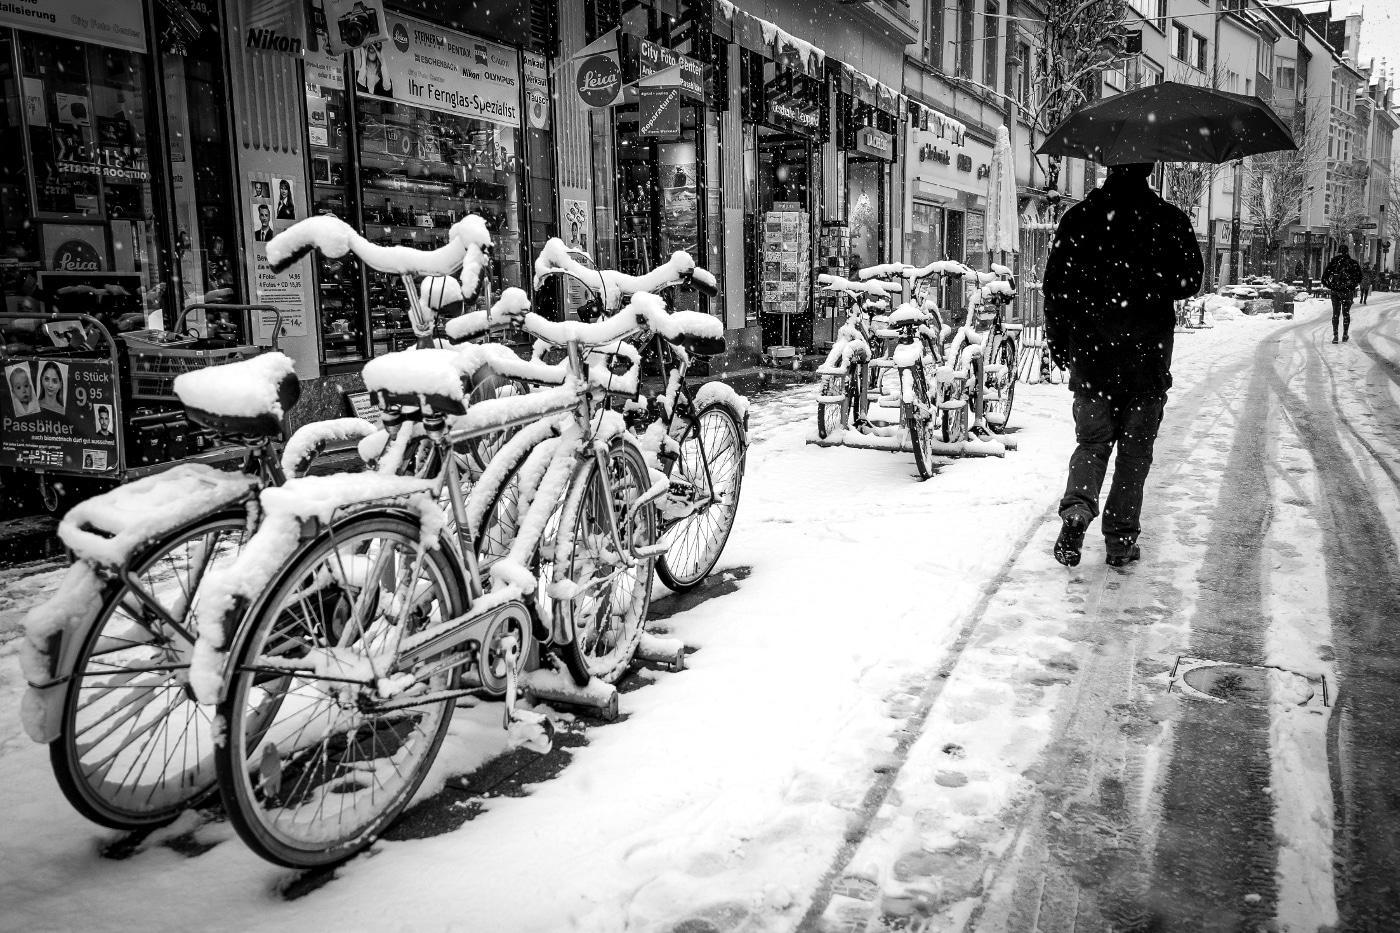 Der erste Schnee - Bonn | © wolfgang röser | worobo